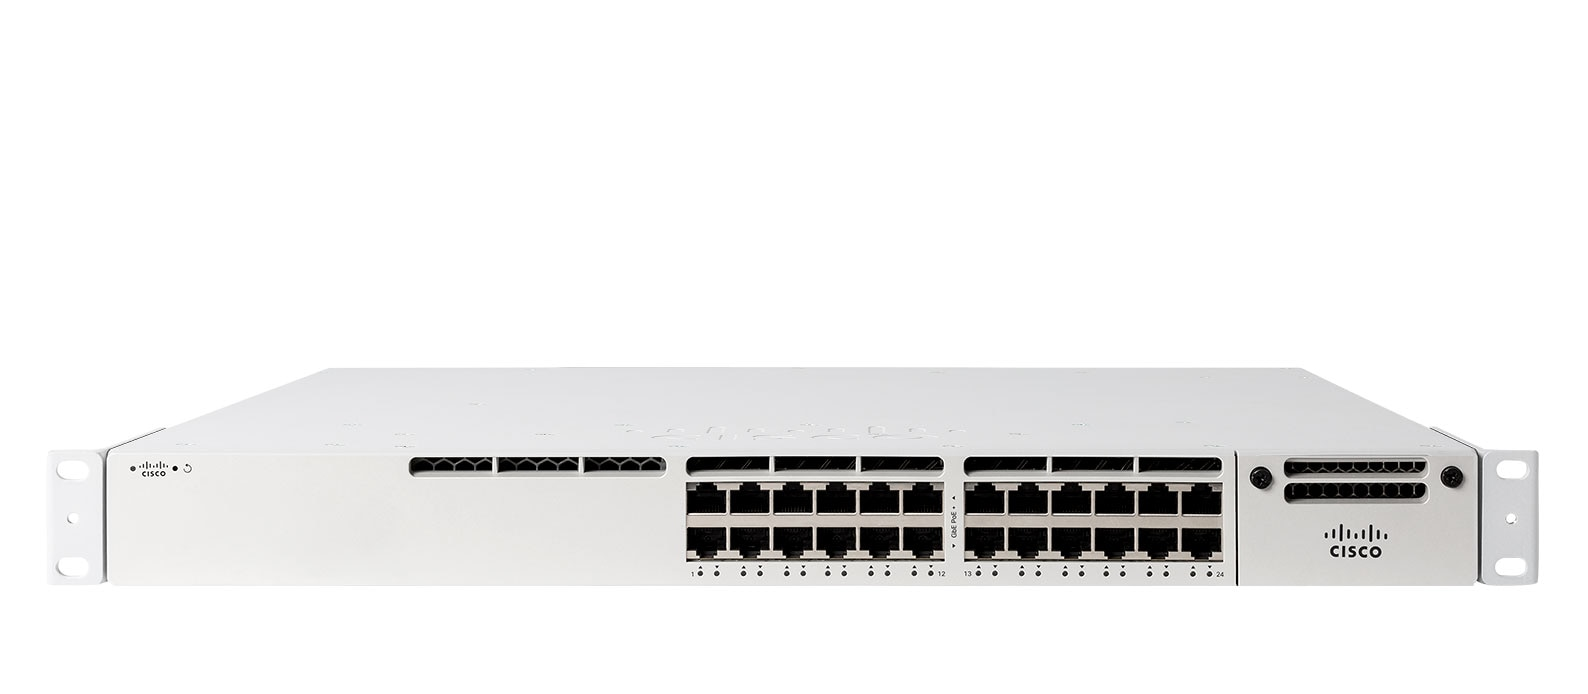 MS390-24